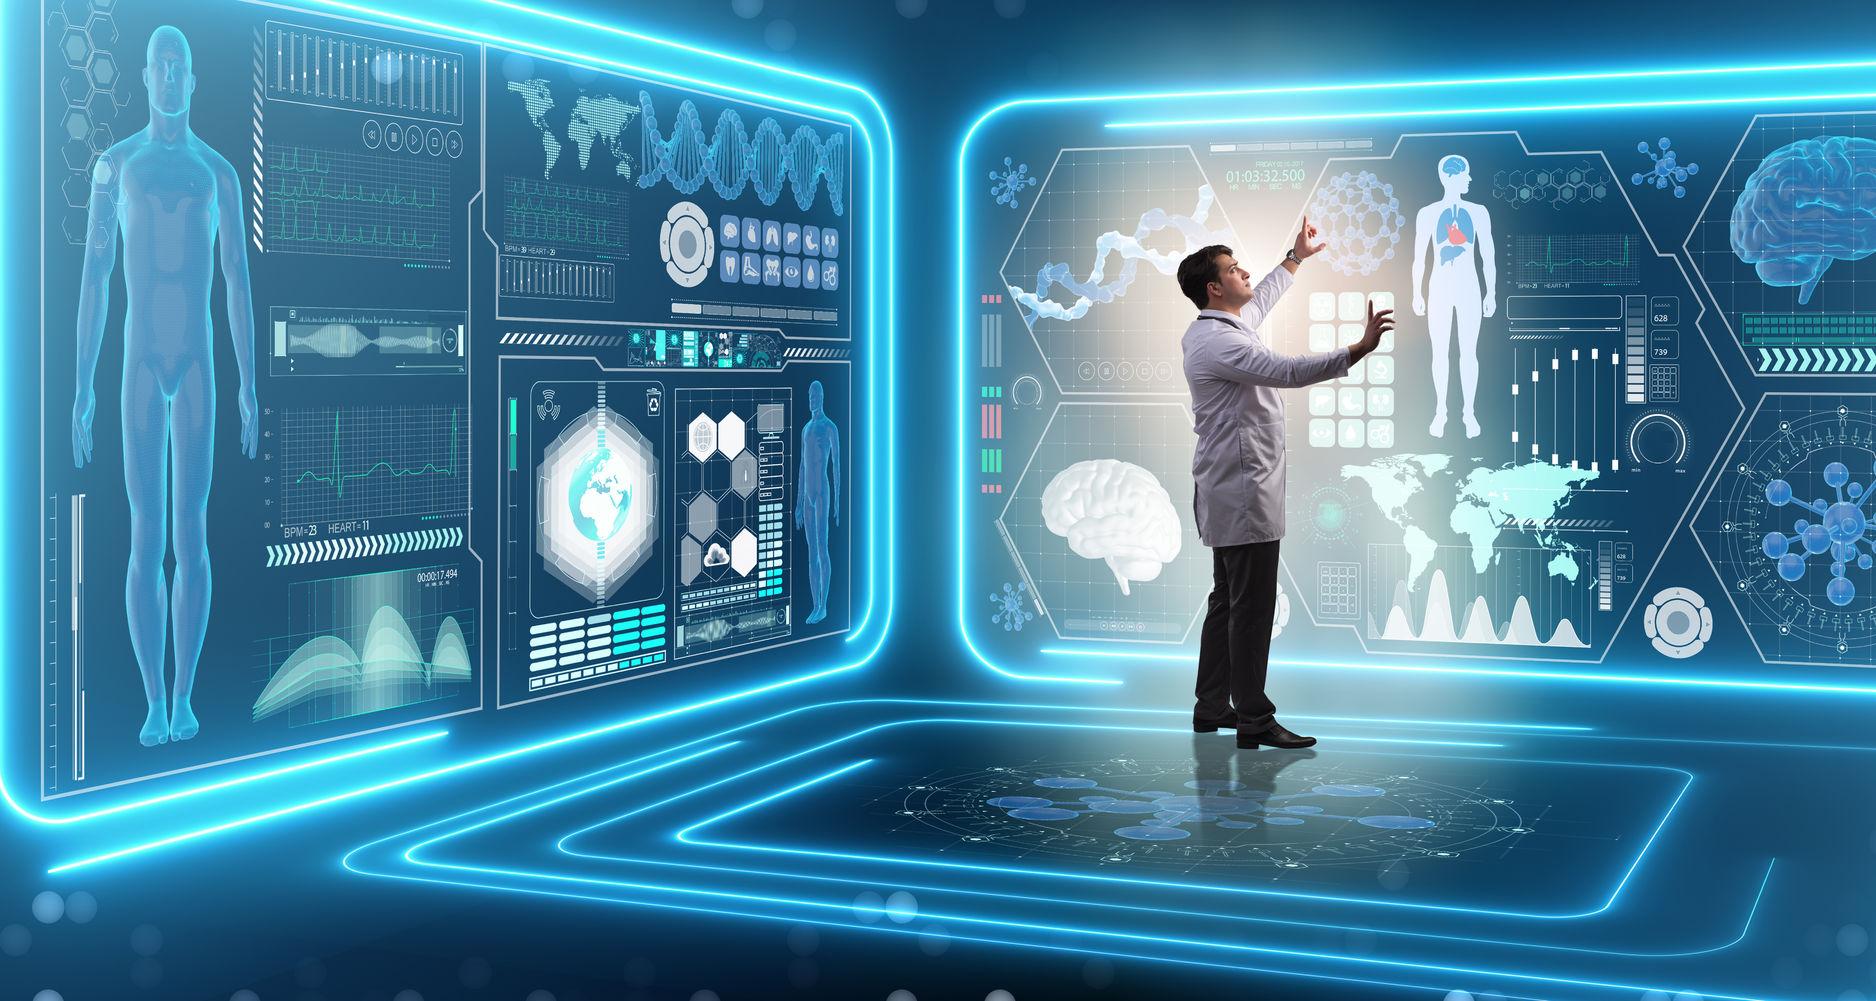 medicina de inteligencia artificial